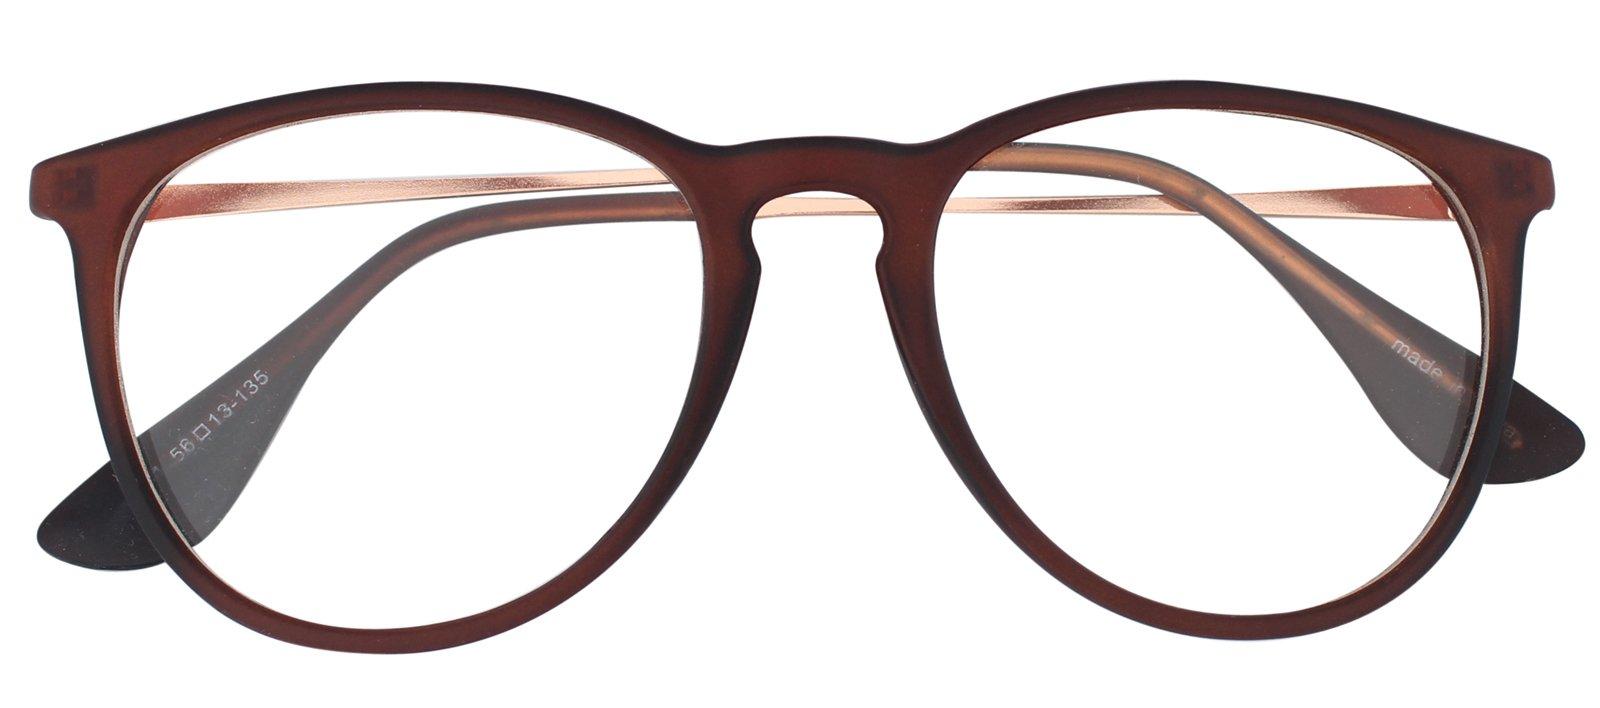 7b65fe15341 Galleon - Oversized Big Round Horn Rimmed Eye Glasses Clear Lens Oval Frame  Non Prescription (Brown 41719)